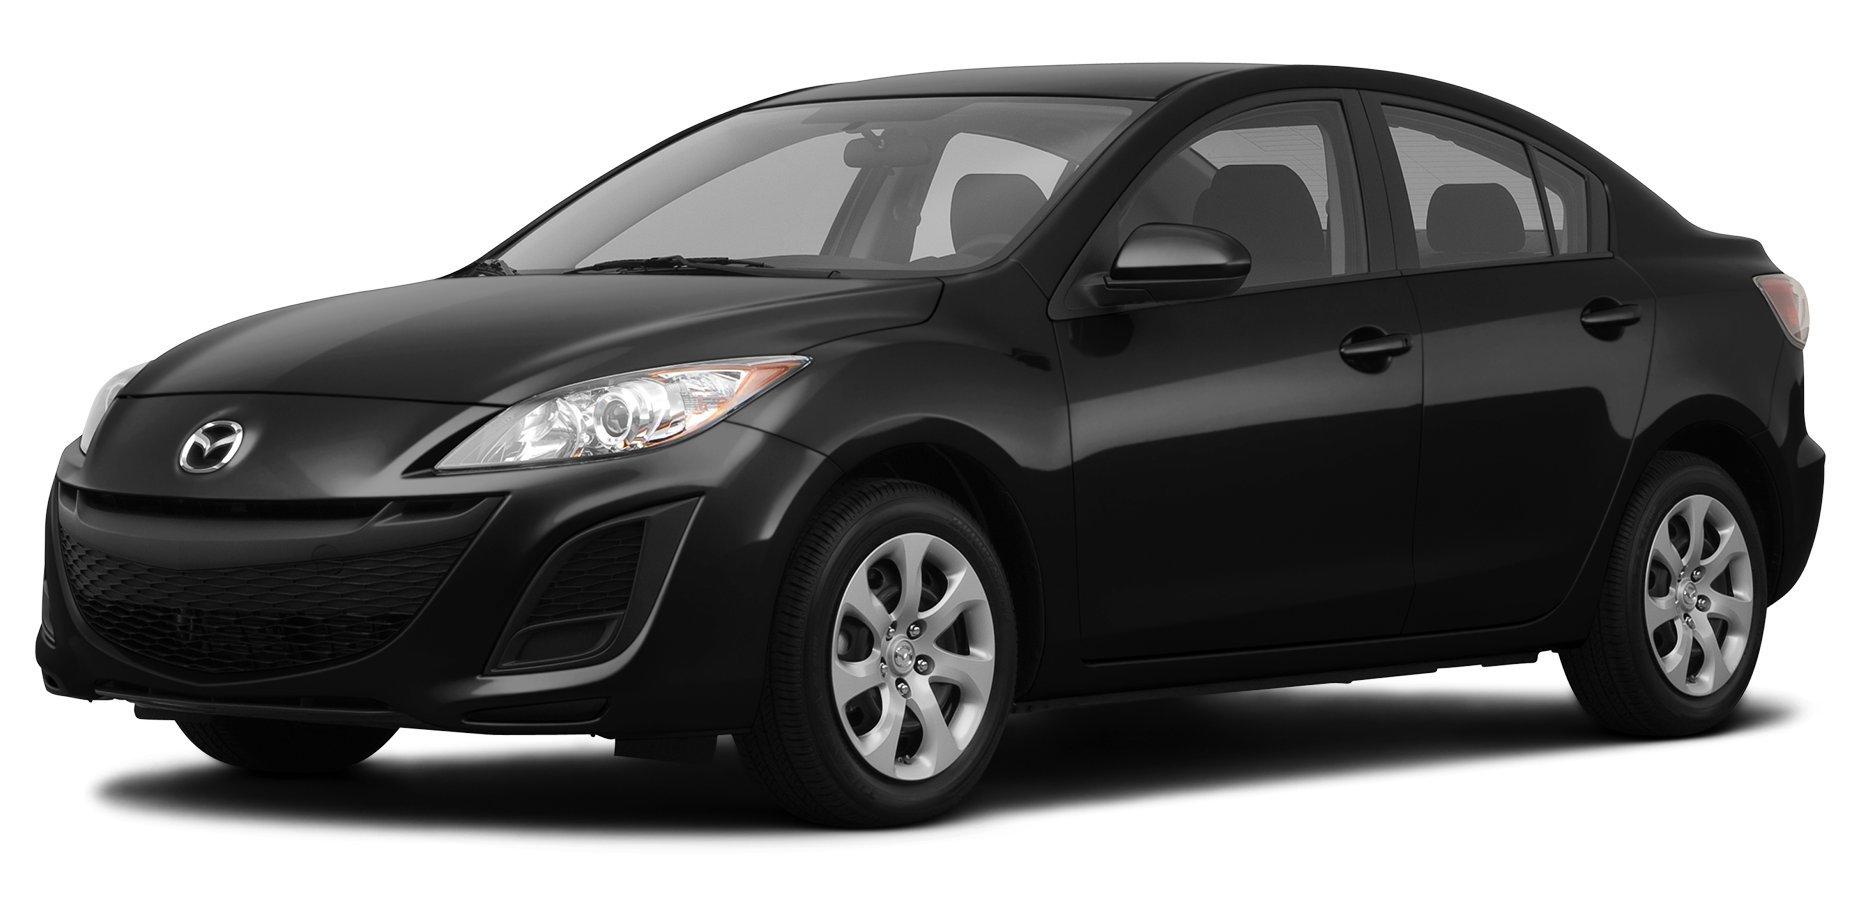 Hyundai Sonata: Front fog light (if equipped)